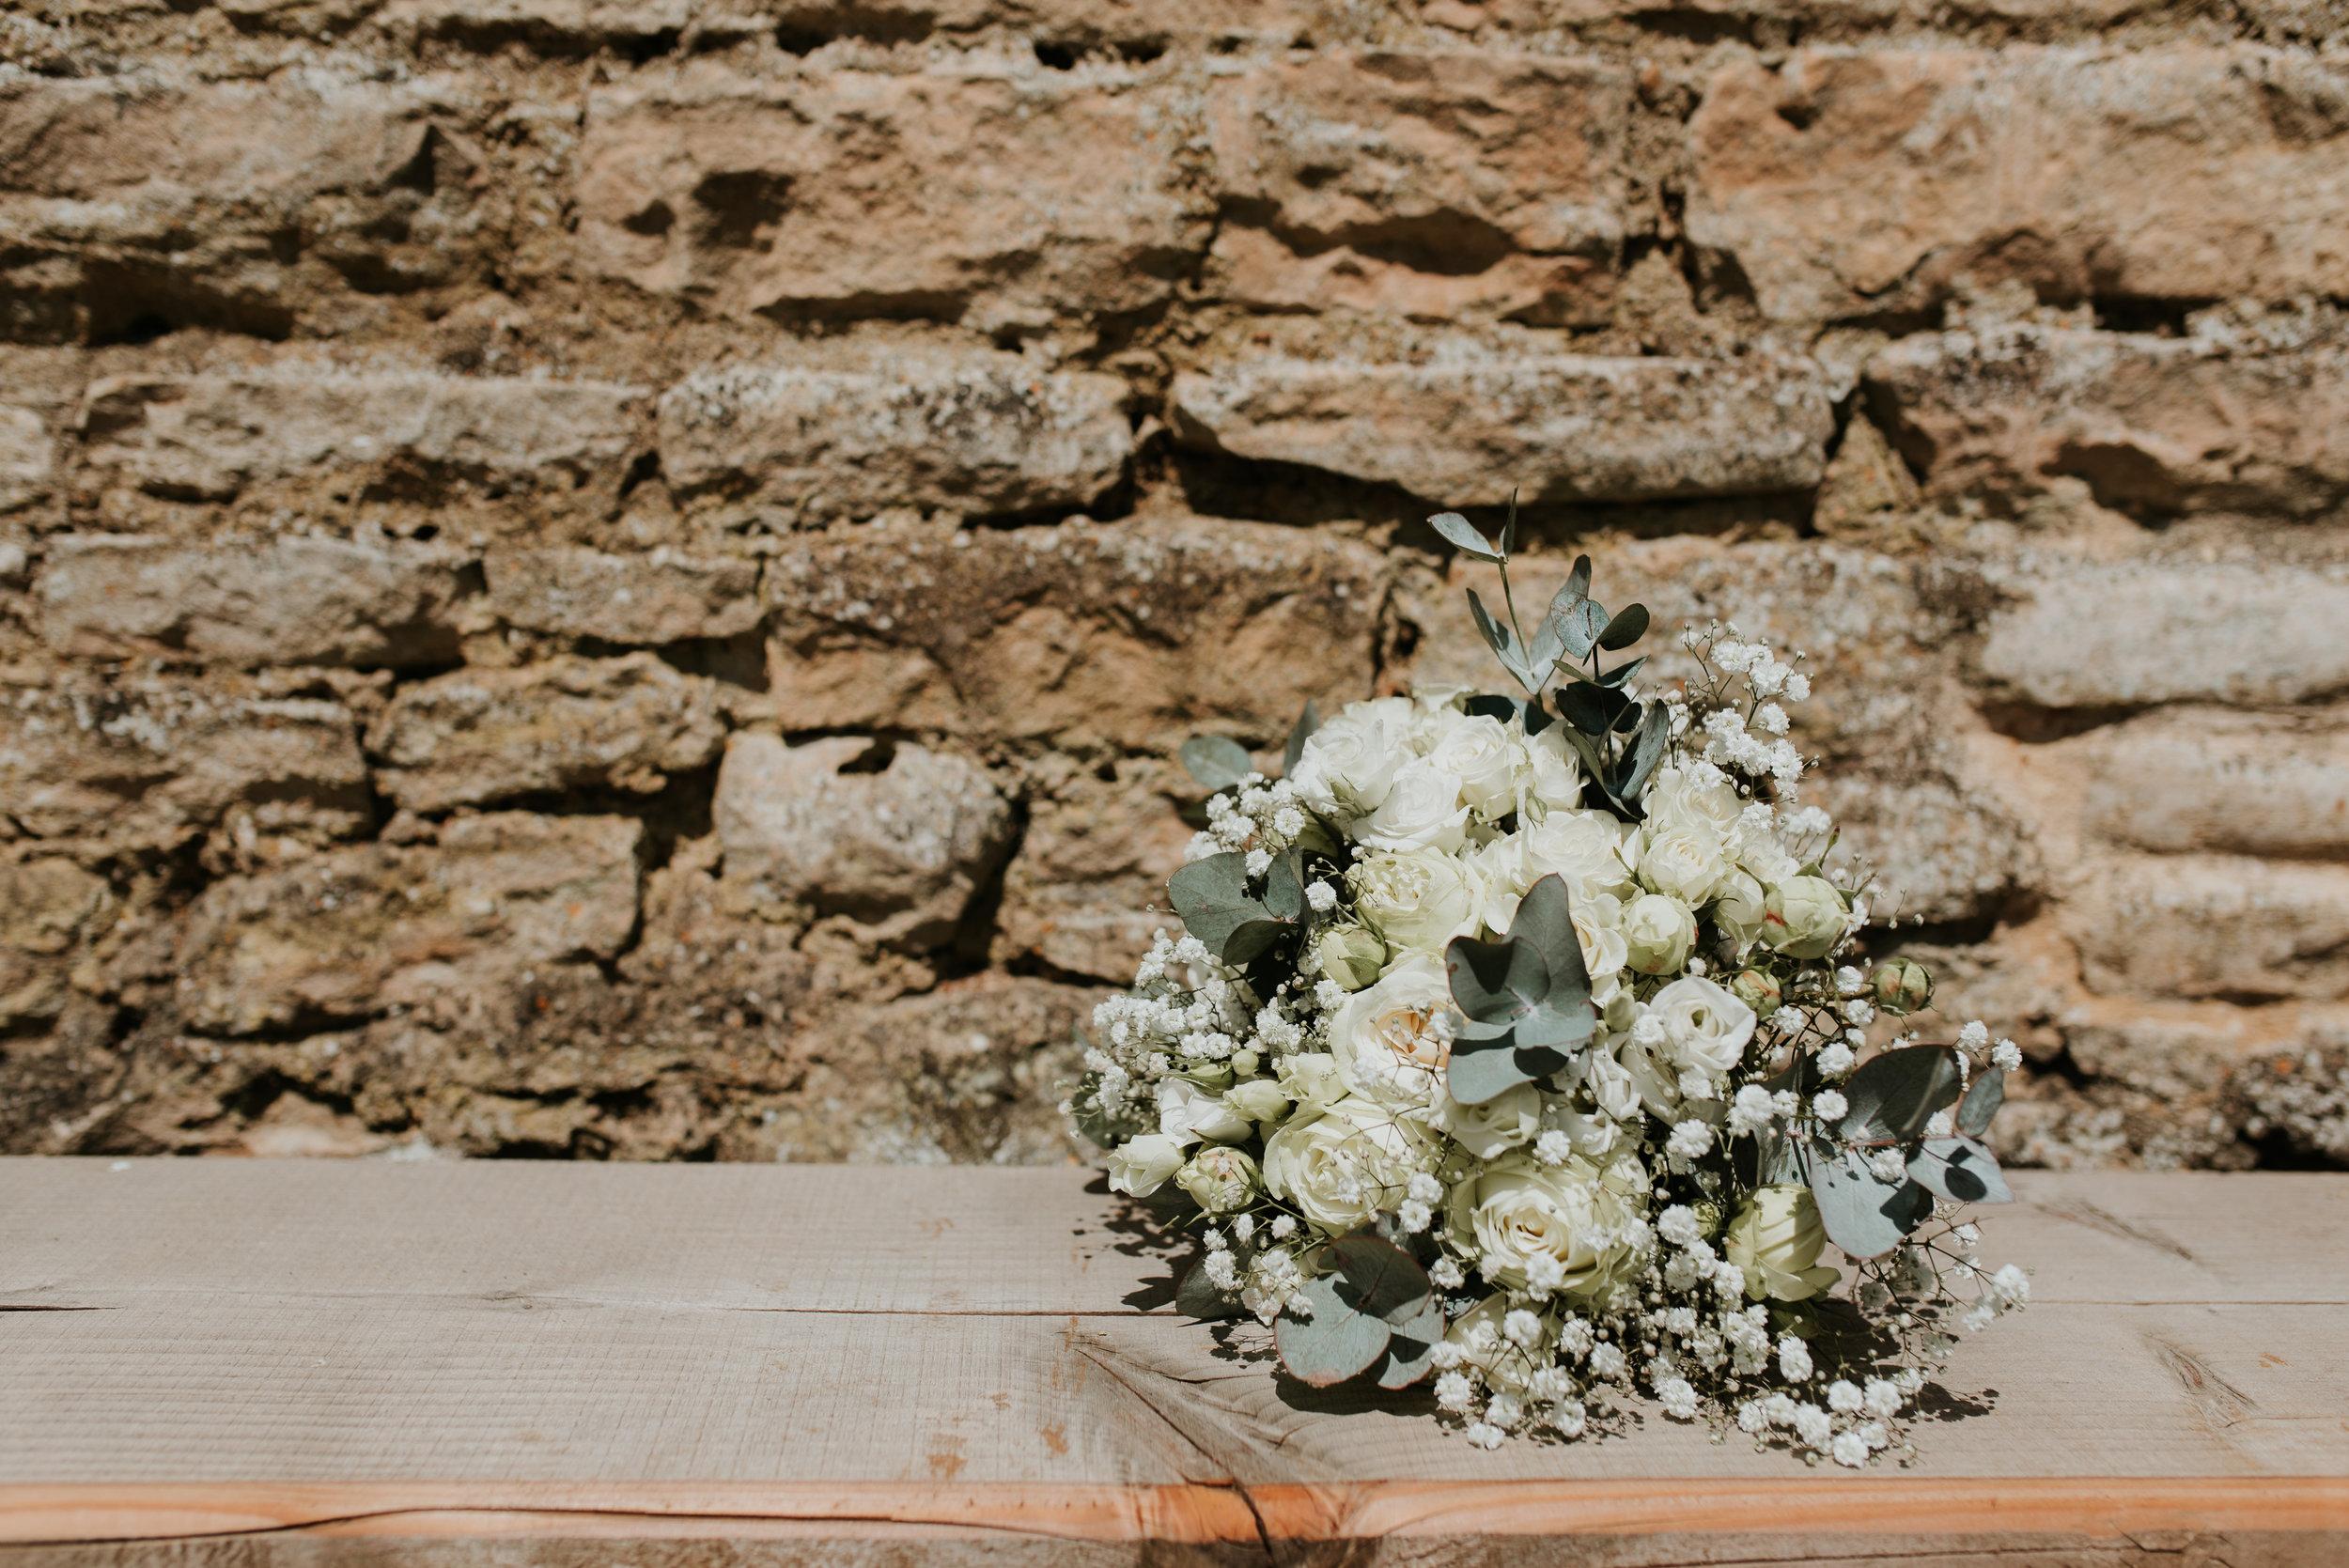 Oxfordshire-wedding-photographer-7.jpg